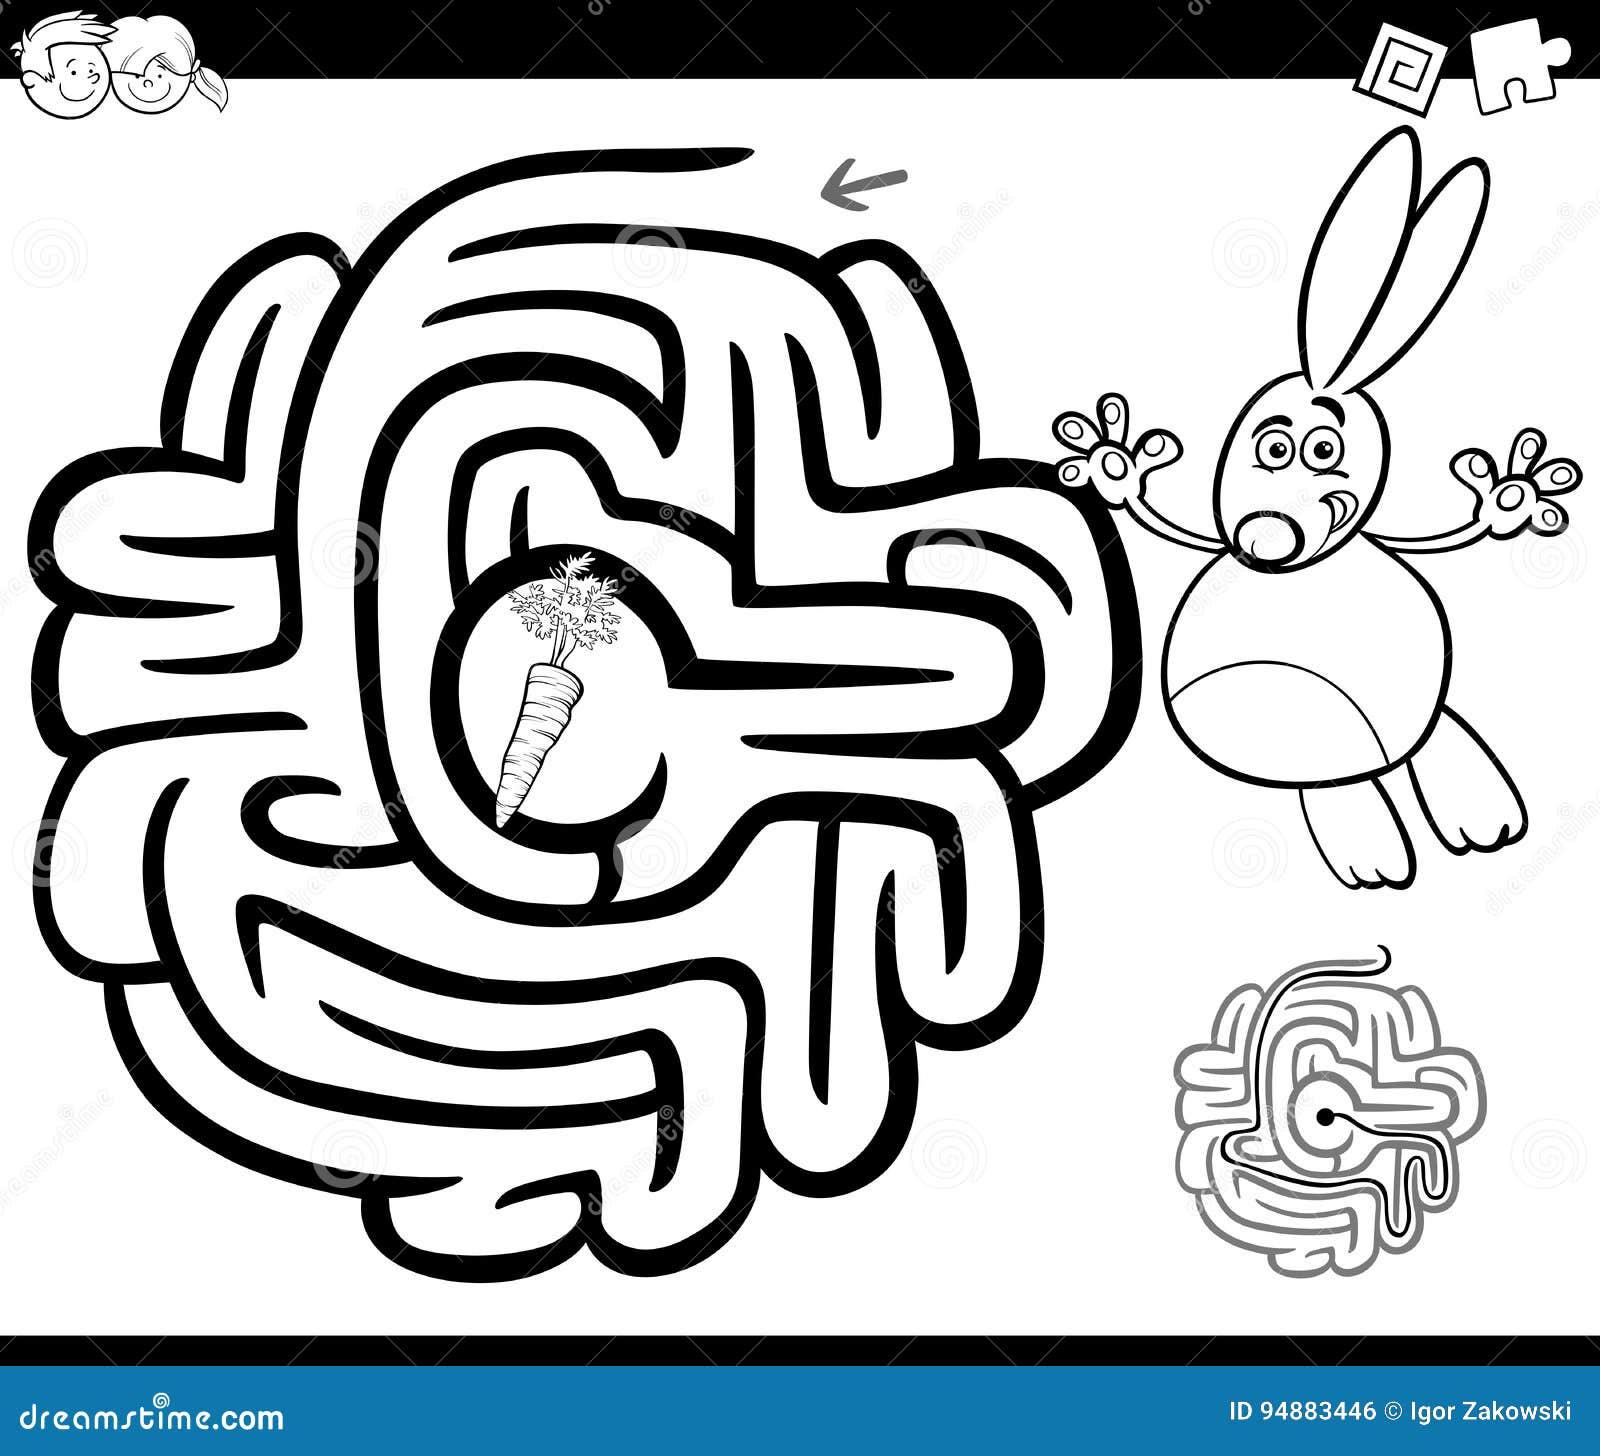 Amazing Medium Printable Mazes Free Worksheet For Kids Maze Find ...